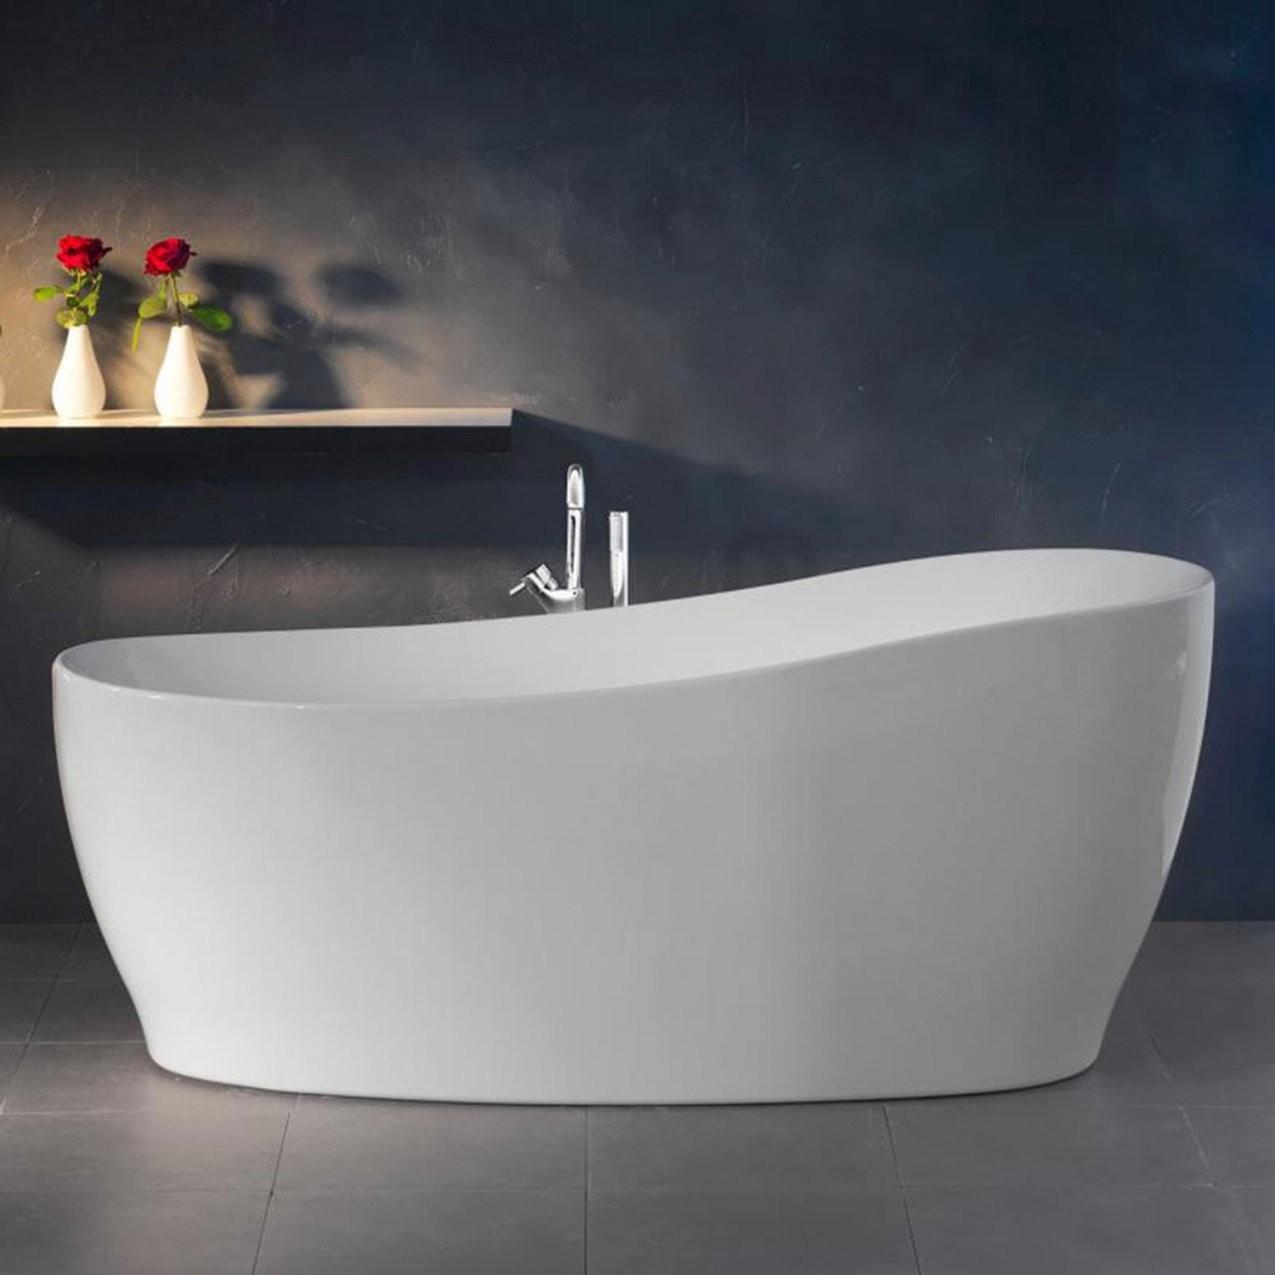 Freistehende Badewanne Aviva 180 Cm X 85 Cm Weiß Kaufen Bei Obi von Bilder Freistehende Badewanne Bild